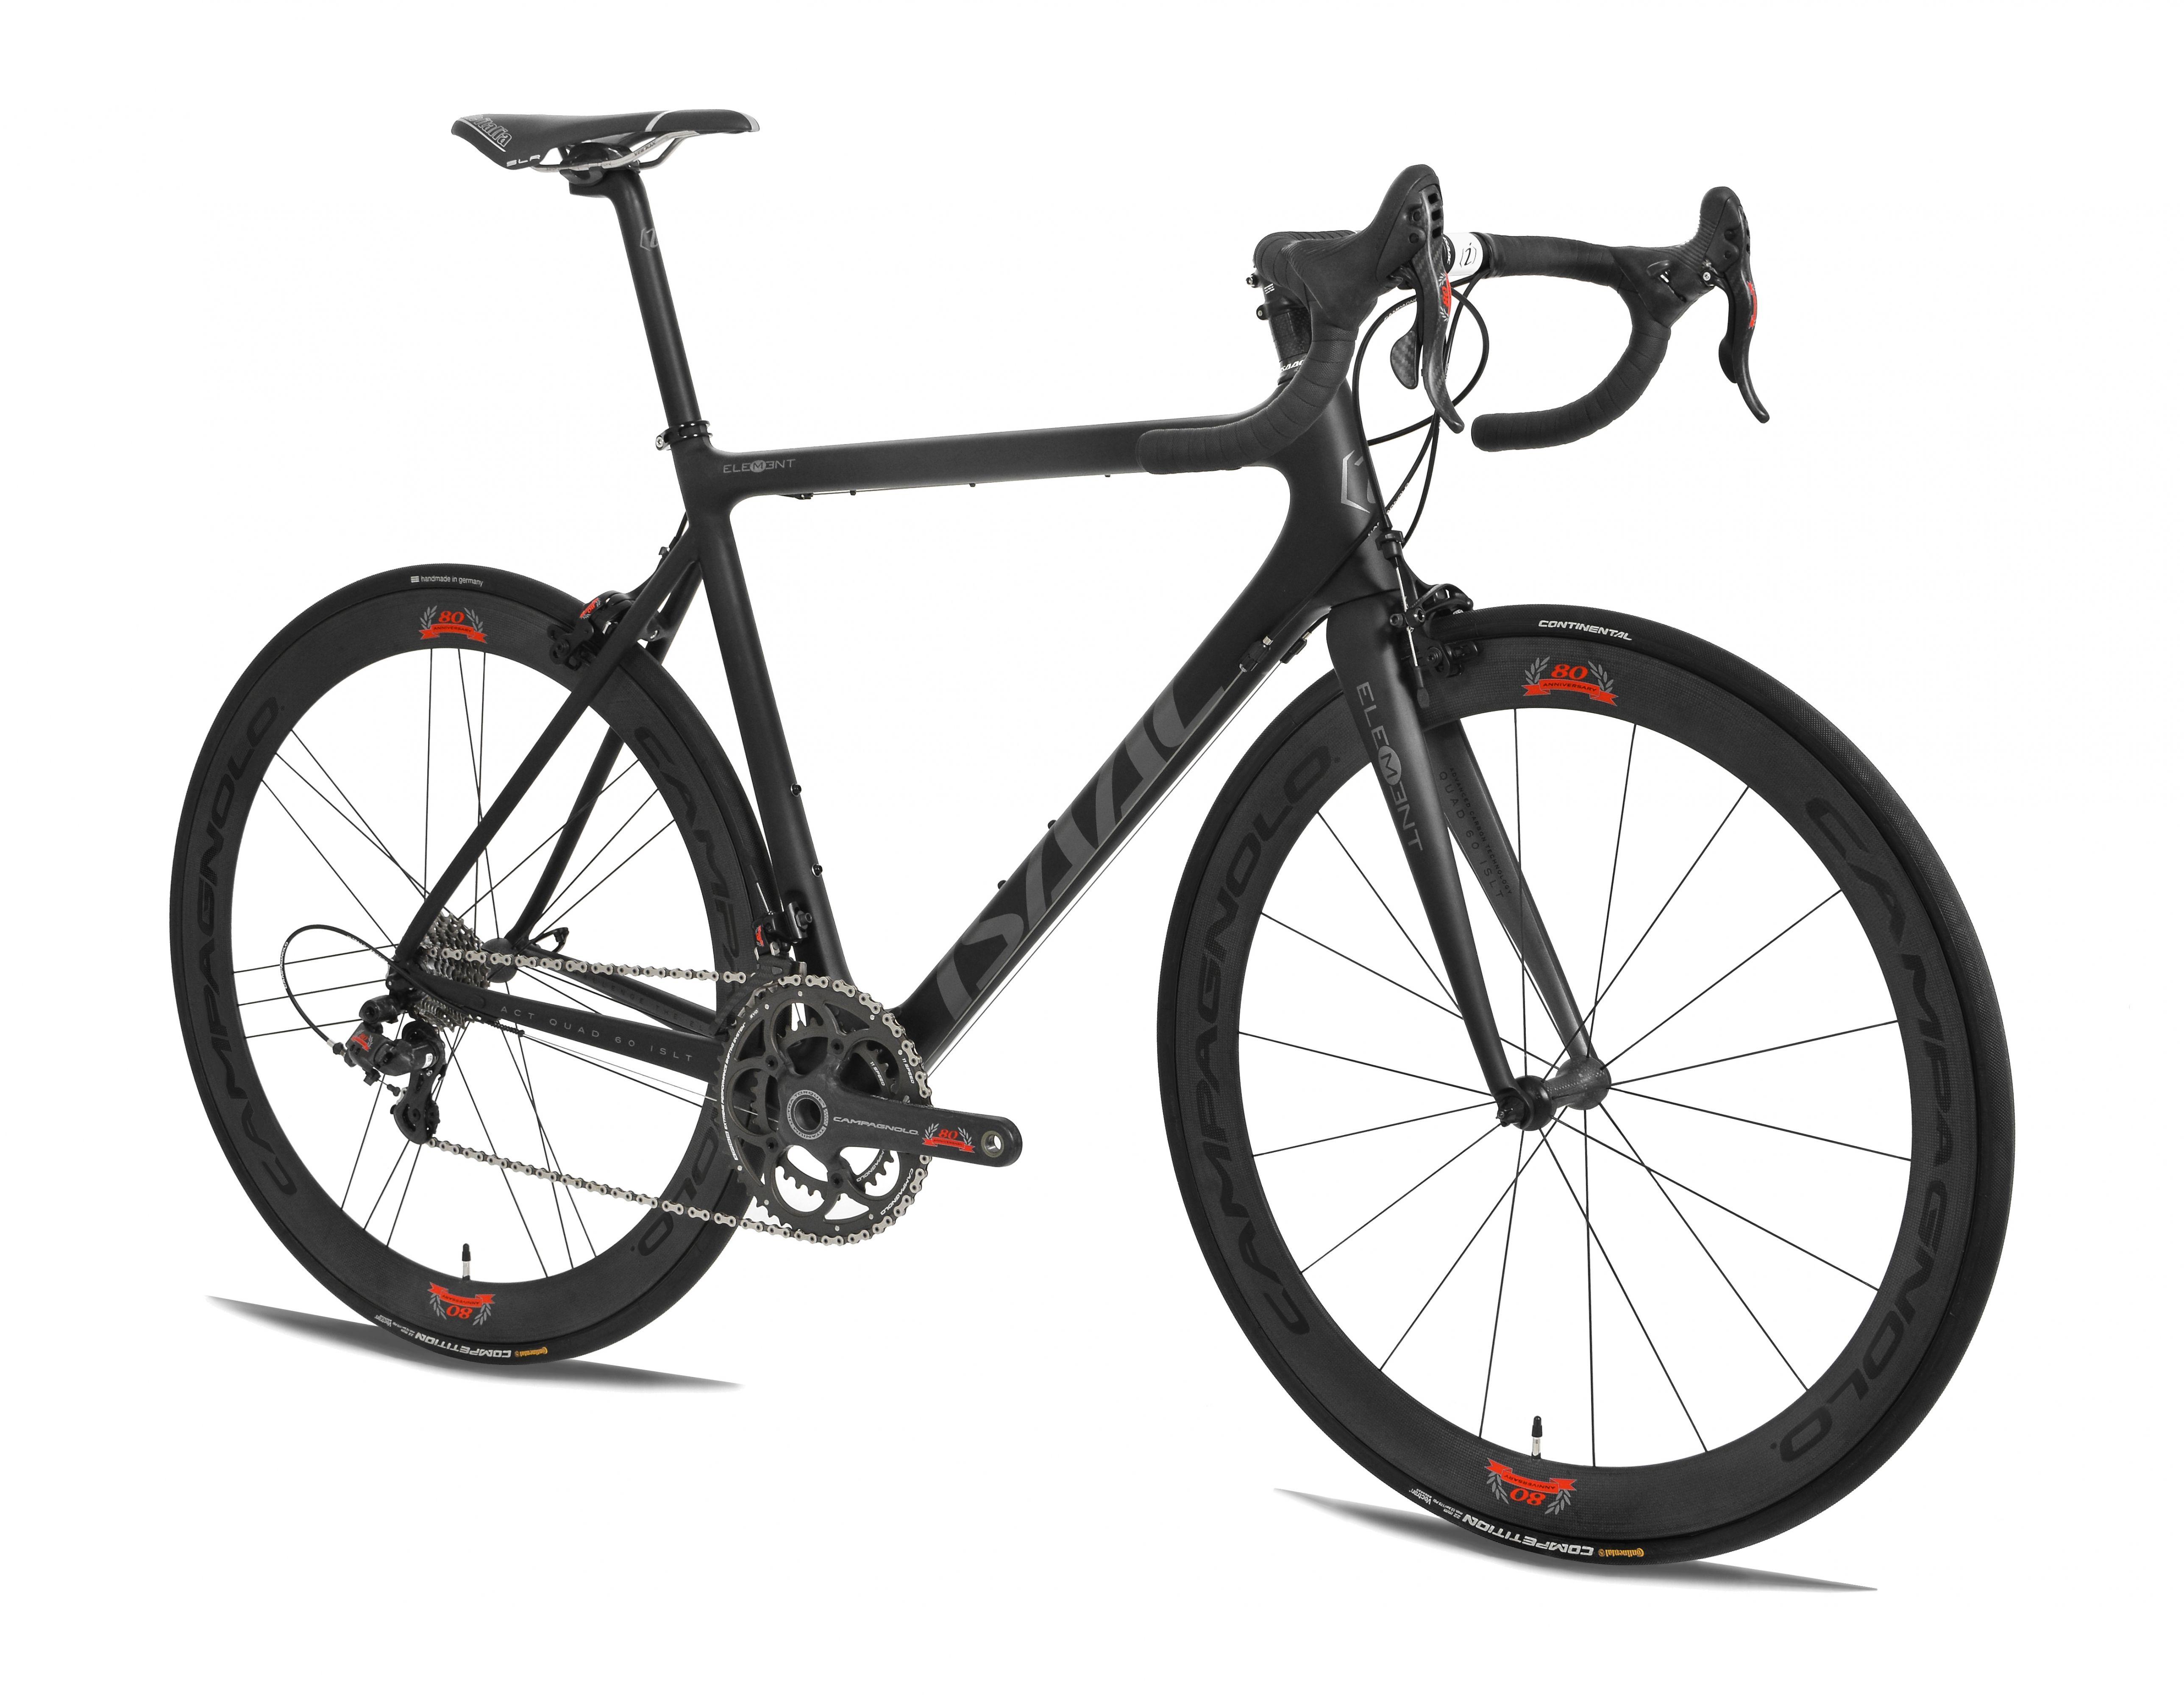 3b7aa95eea6 Isaac Element | The world's prettiest bikes | Cycling bikes, Road ...